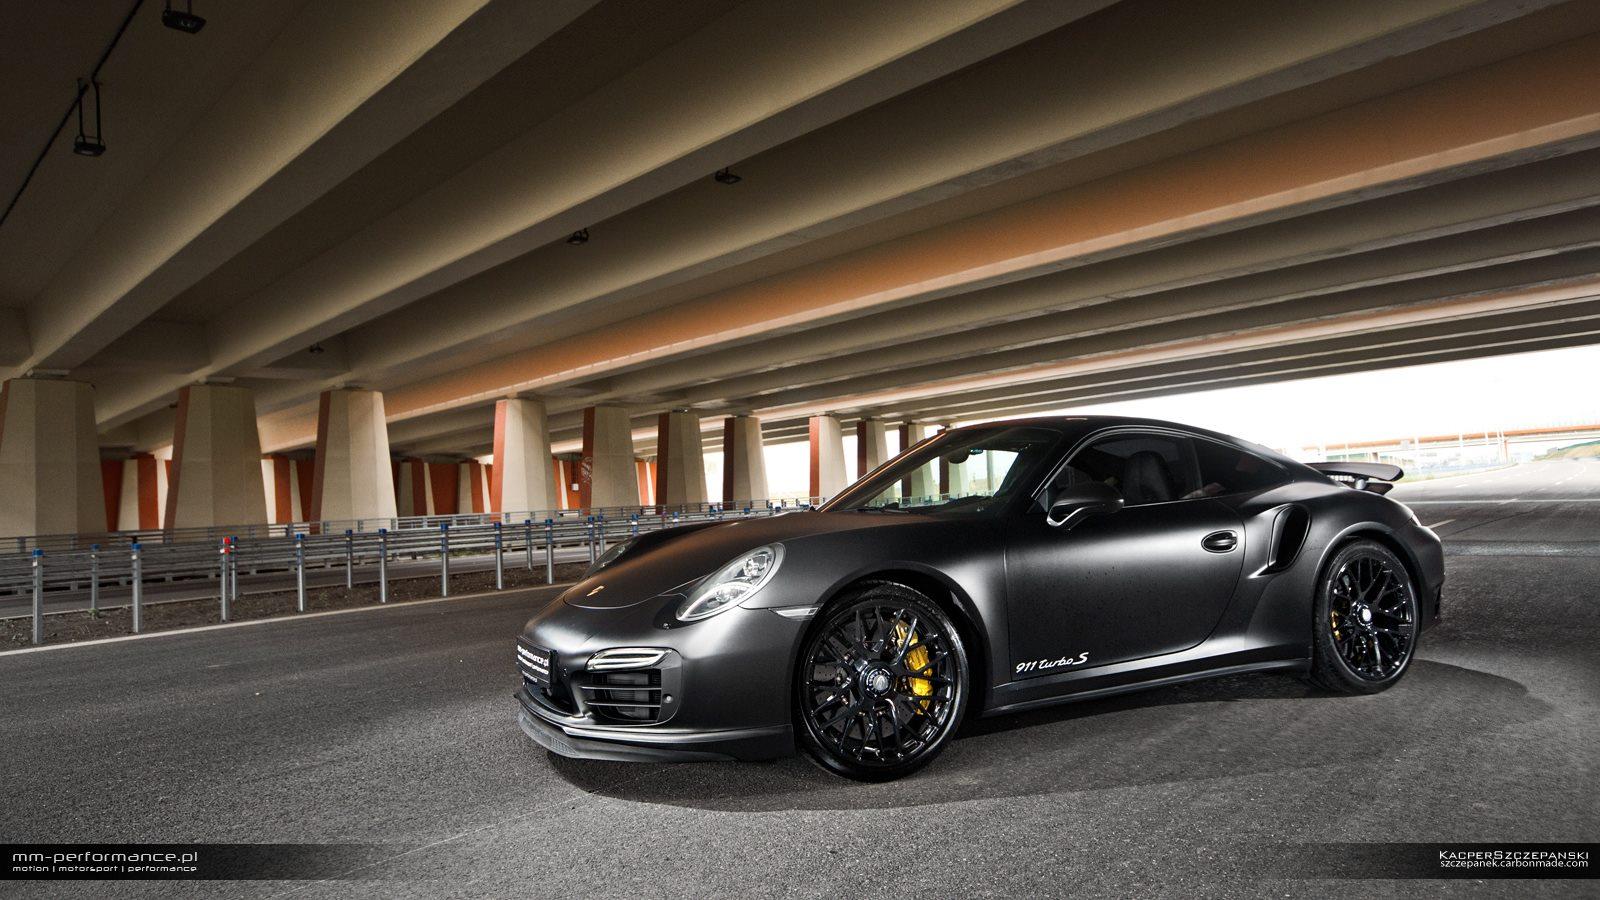 930 Turbo Porsche For Sale >> Matte Black Porsche 911 Turbo S by MM-Performance - GTspirit